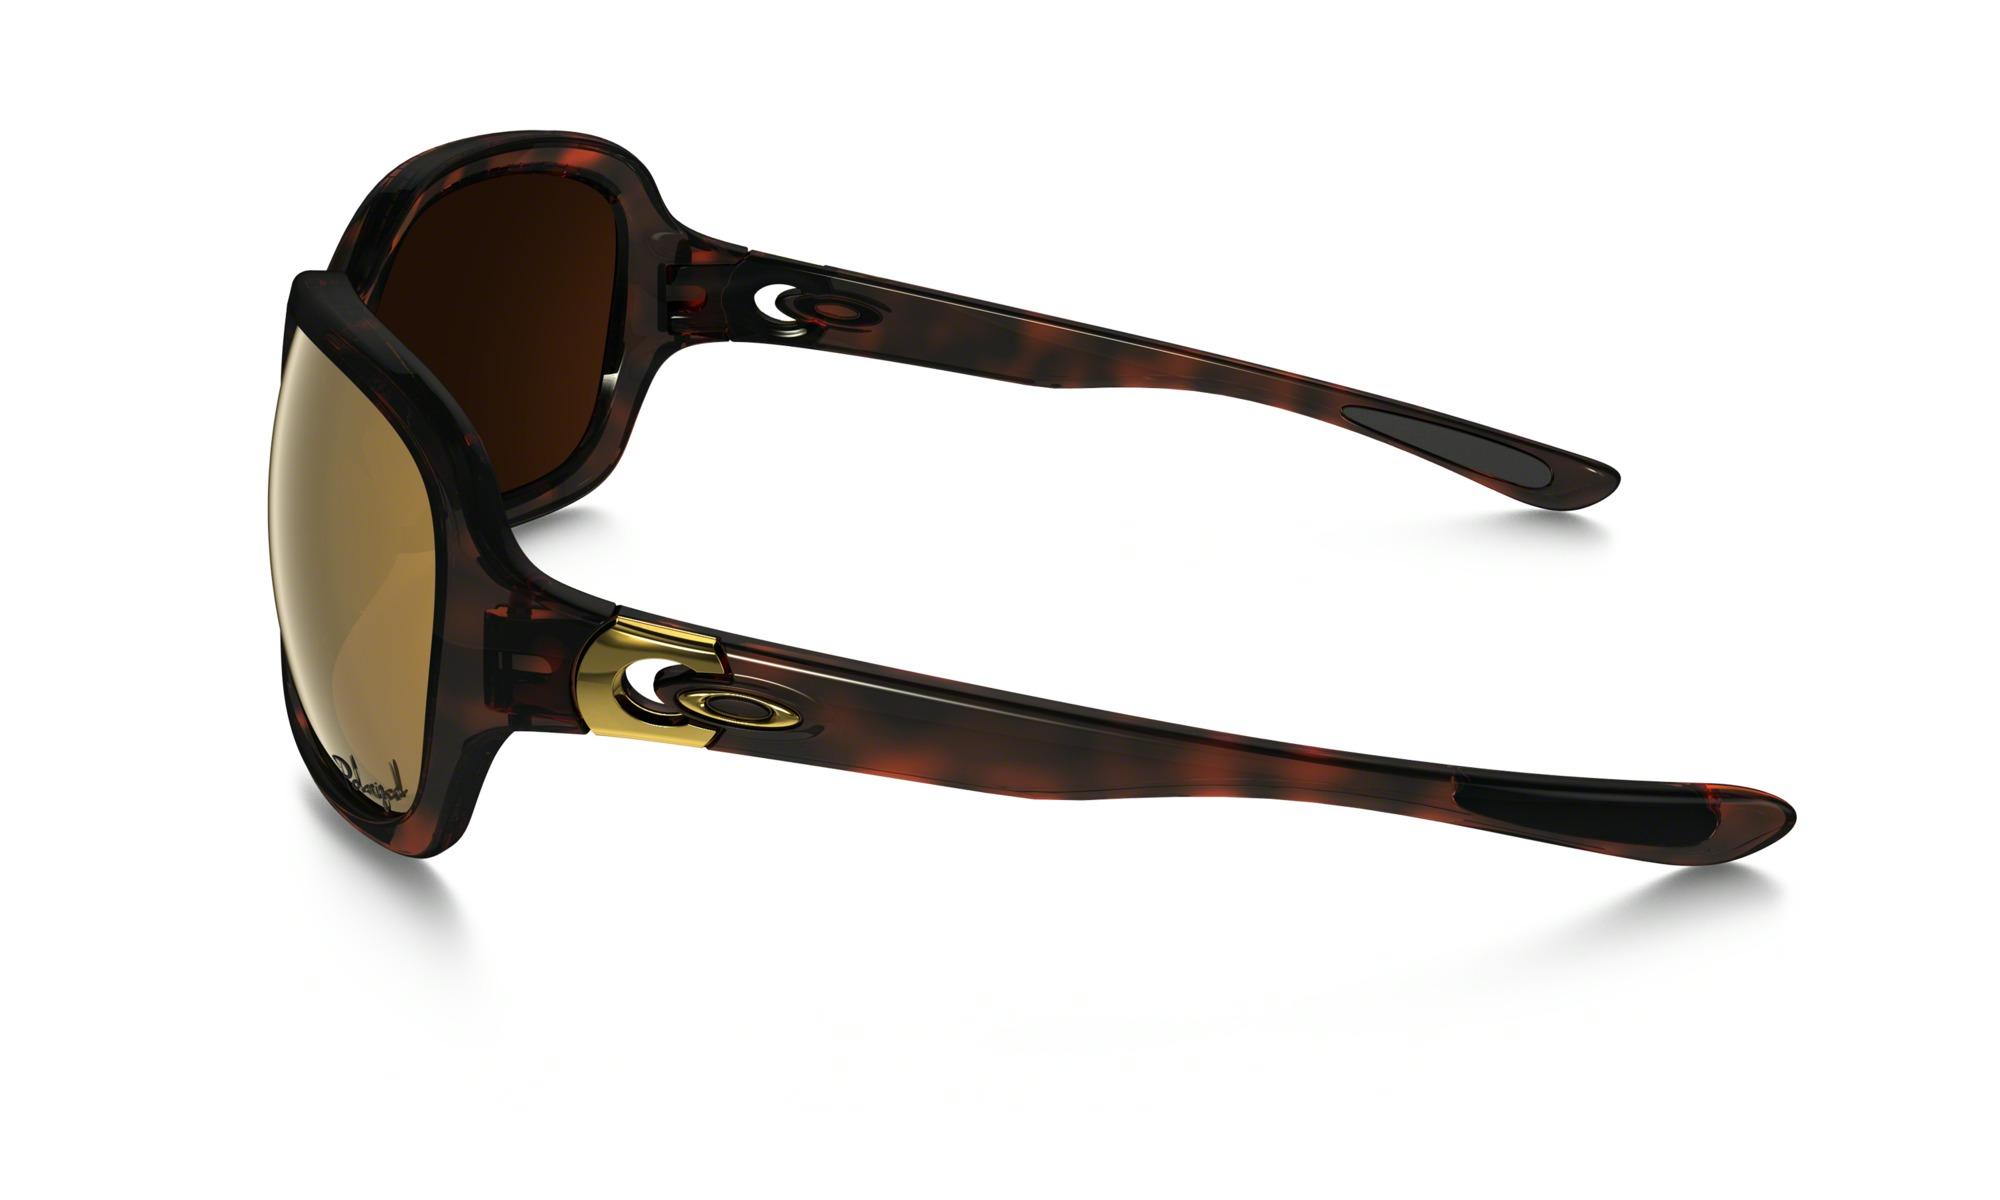 097363018d Oakley Pulse Polarized in Tortoise Brown Gradient Polarized